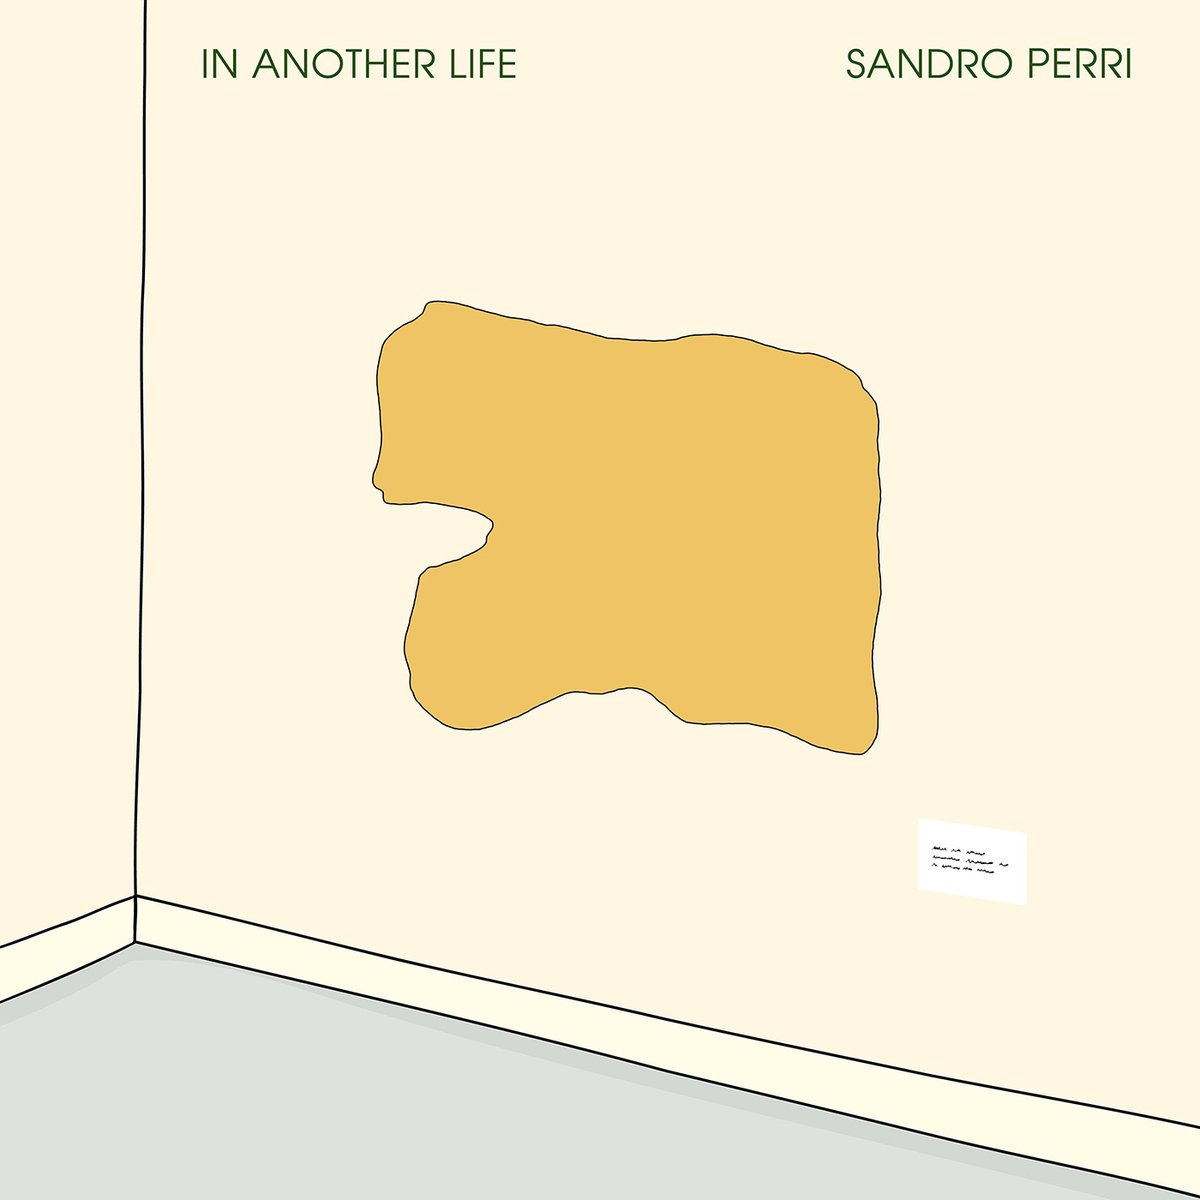 Sandro Perri, In Another Life album art